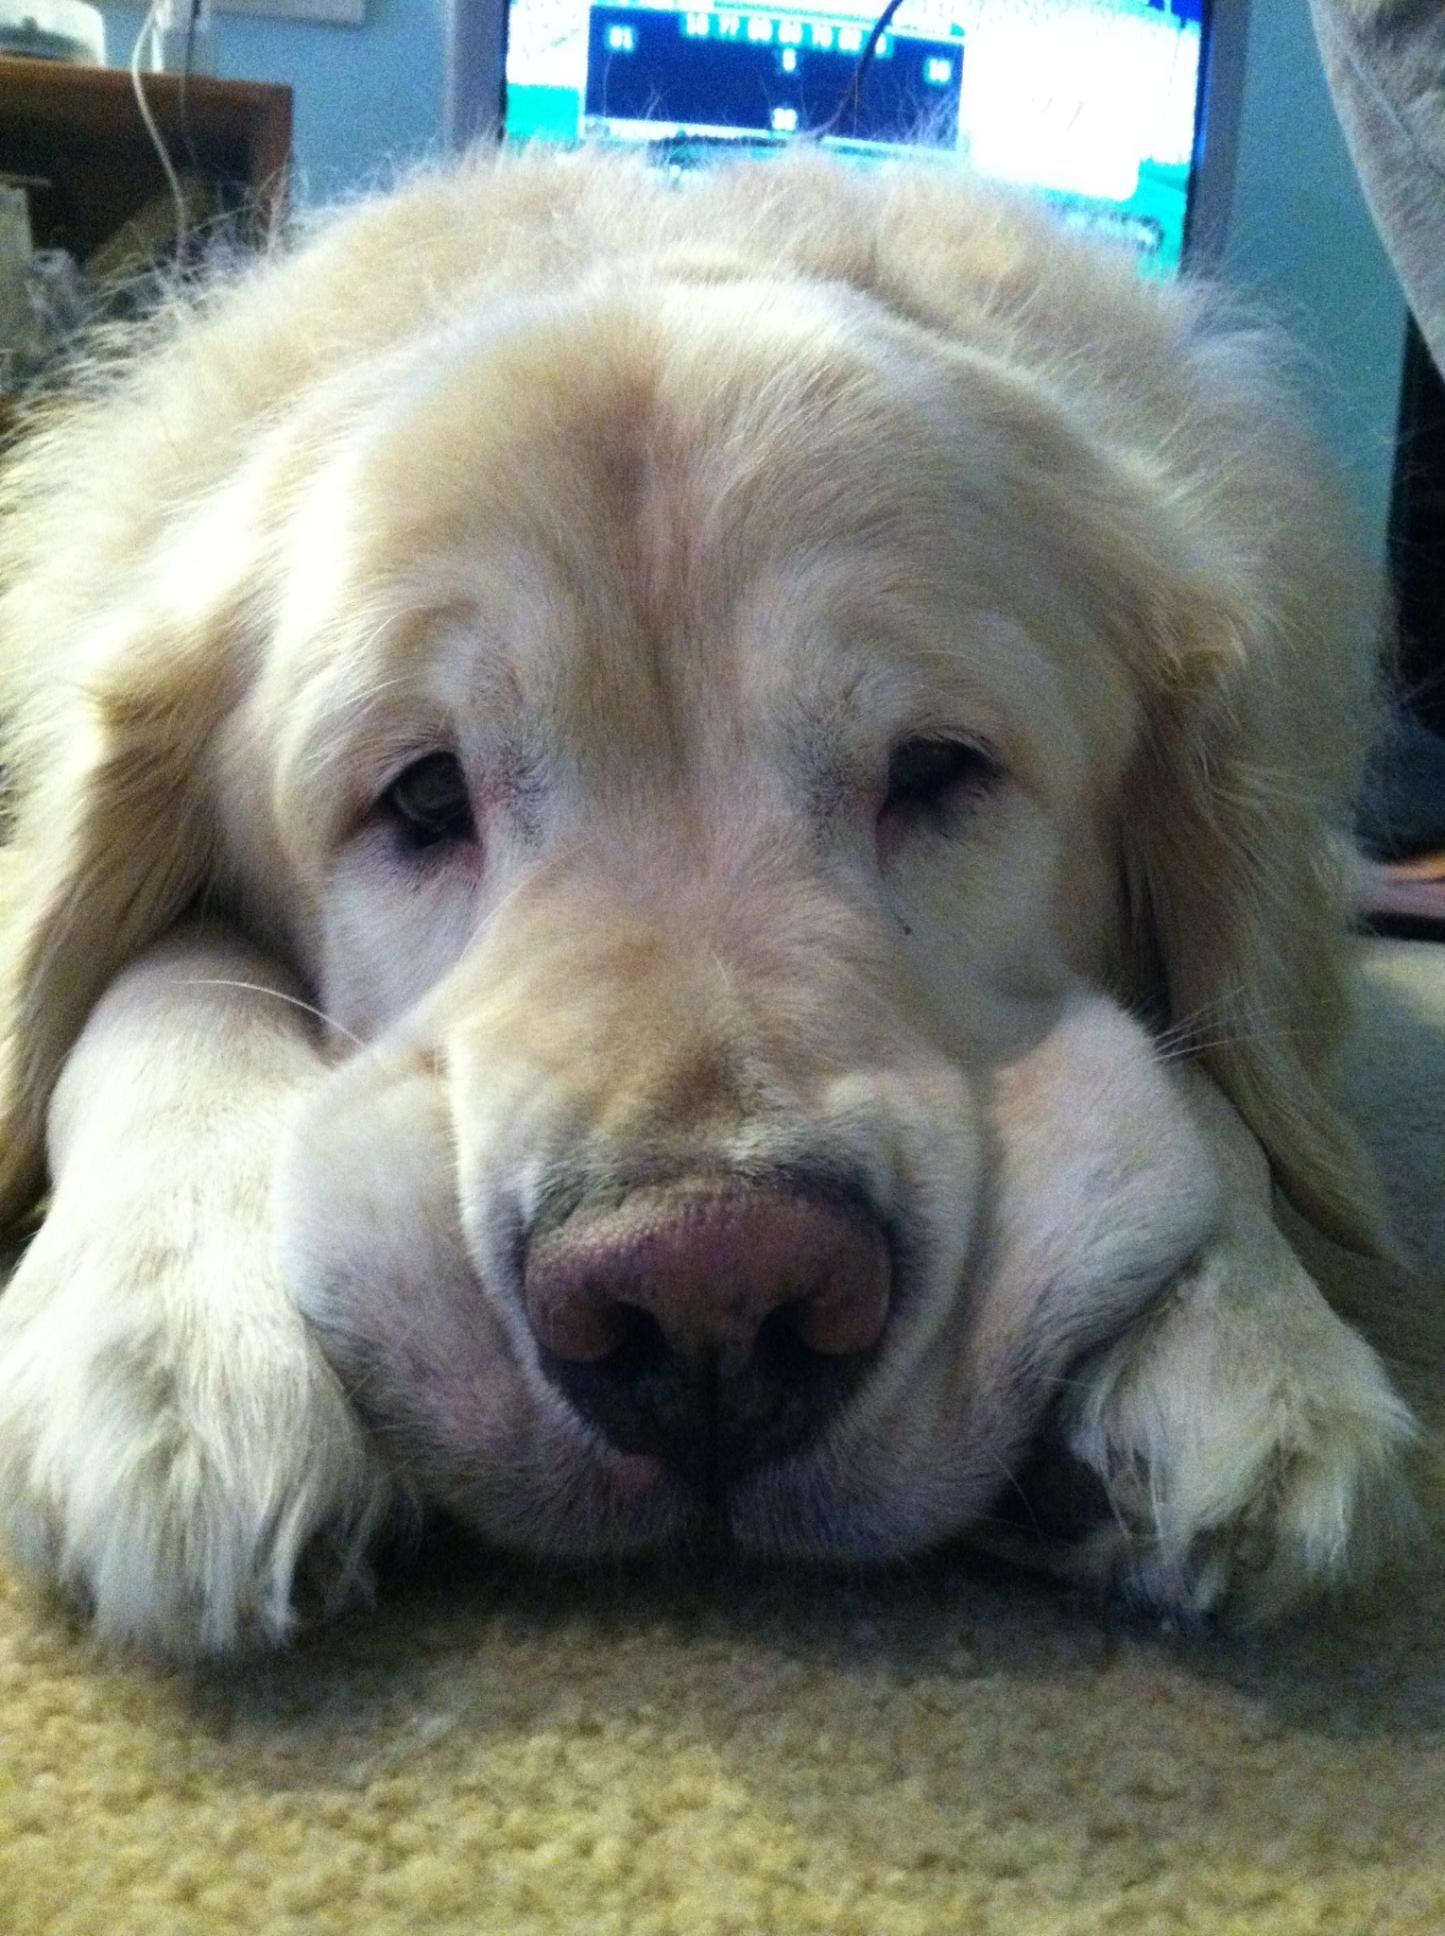 Simple Real Chubby Adorable Dog - b695b207e73380b5a3d6e1065cd37e5f  HD_469285  .jpg